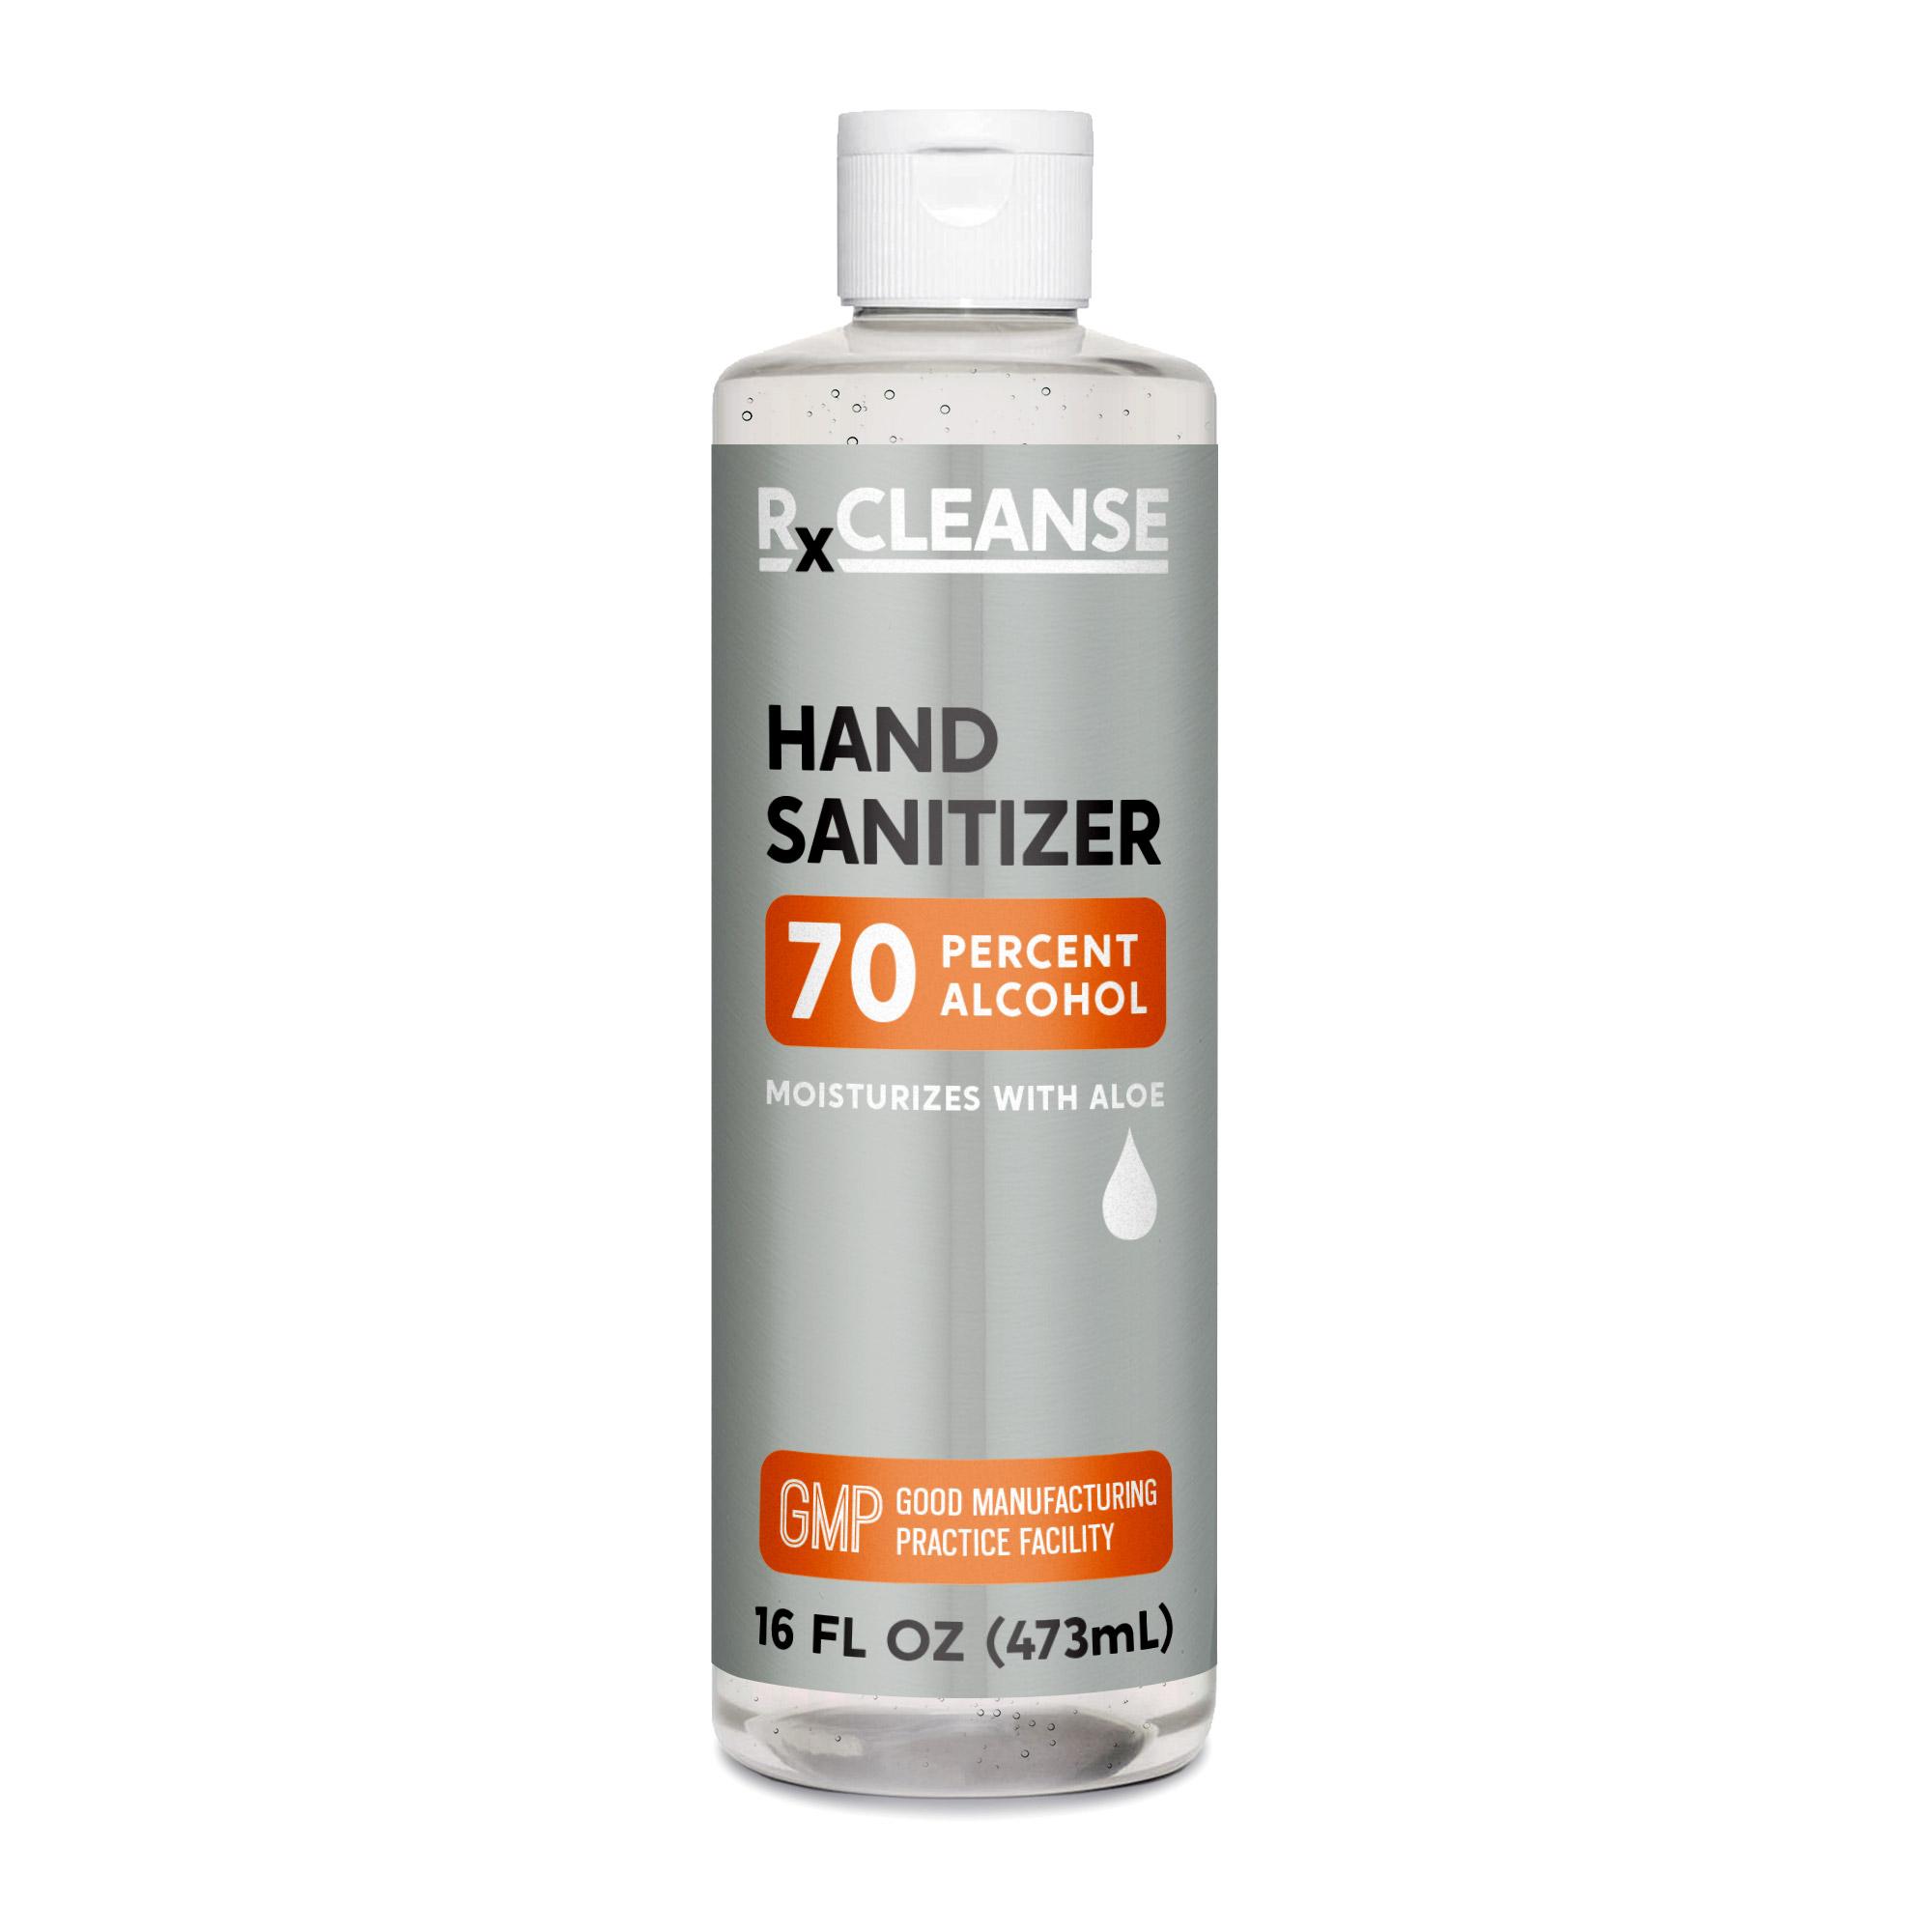 RxCLEANSE Hand Sanitizer RapidGel